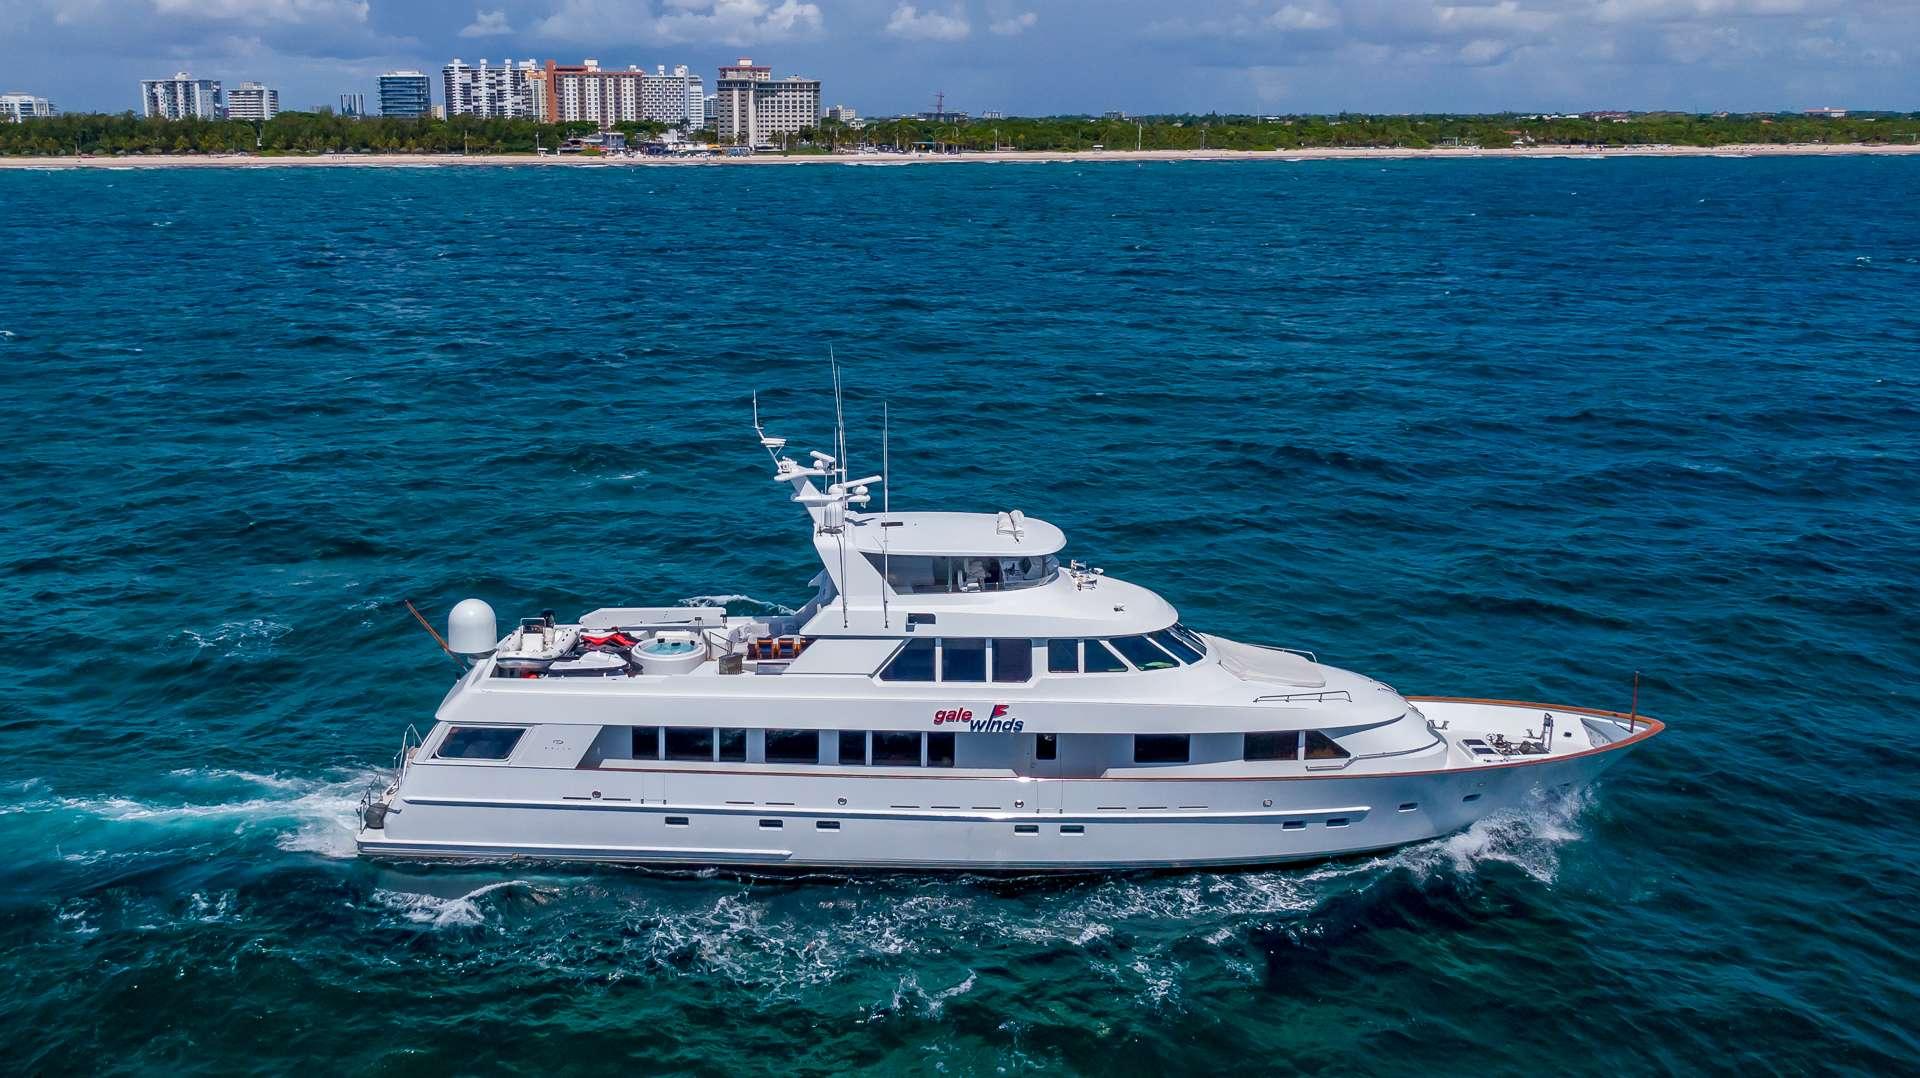 Main image of CRESCENDO IV yacht